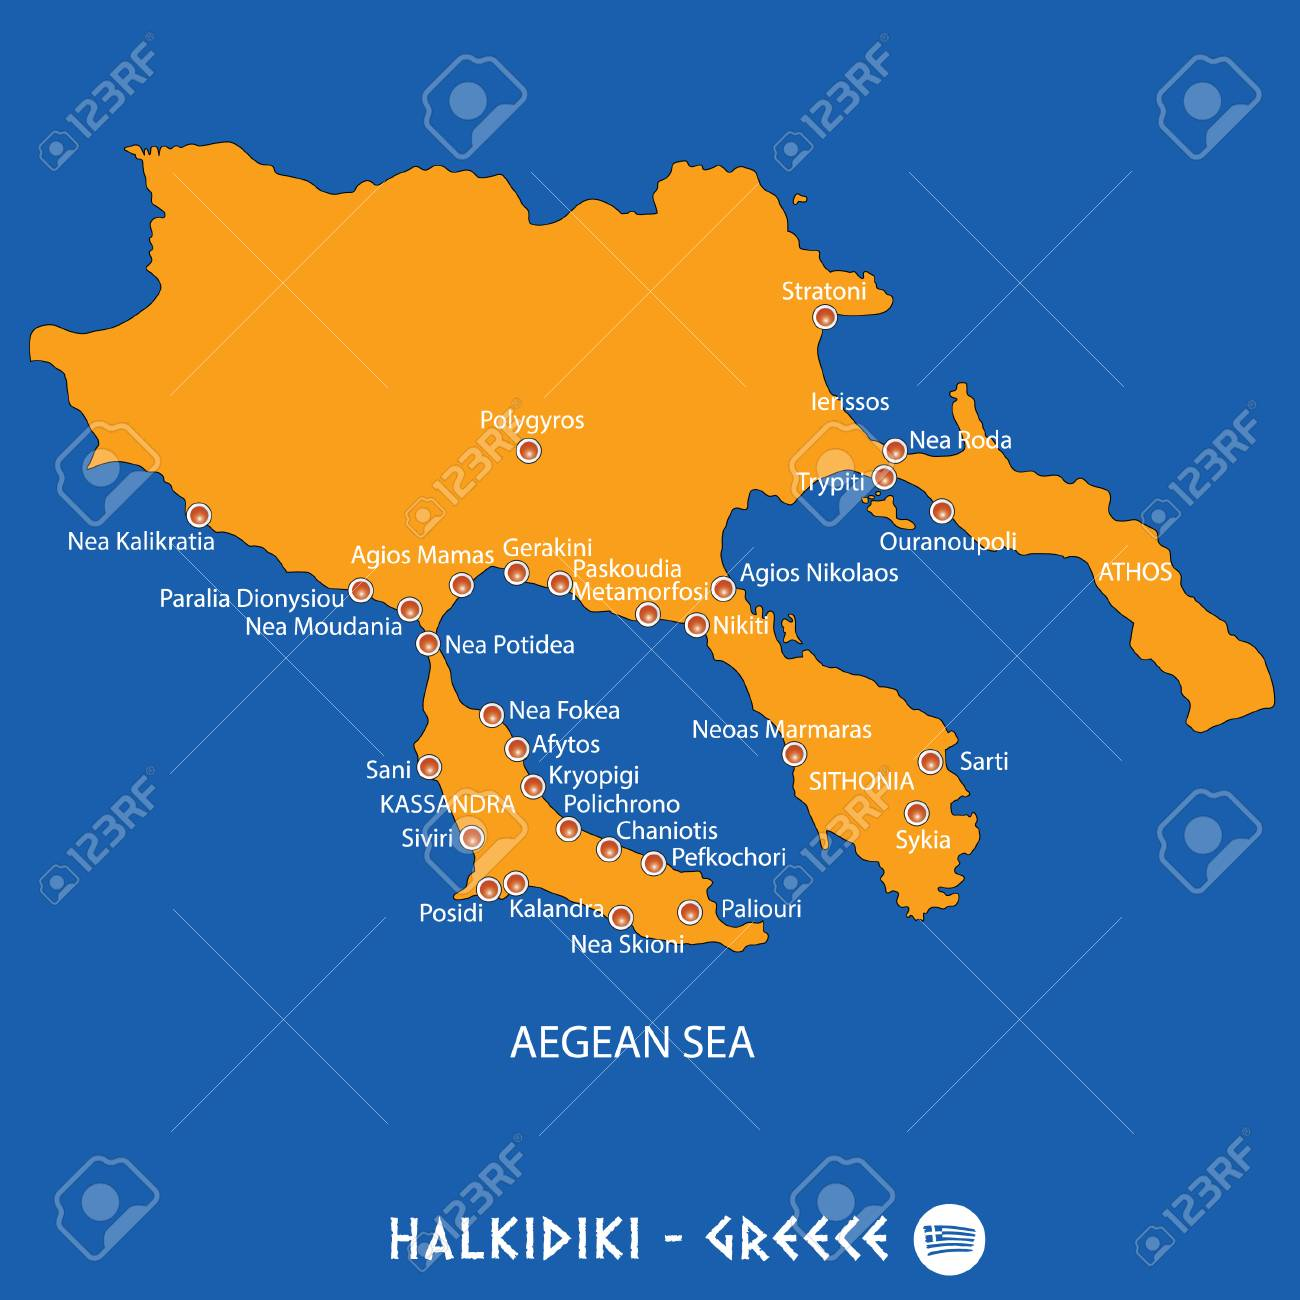 peninsula of halkidiki in Greece orange map art and blue background